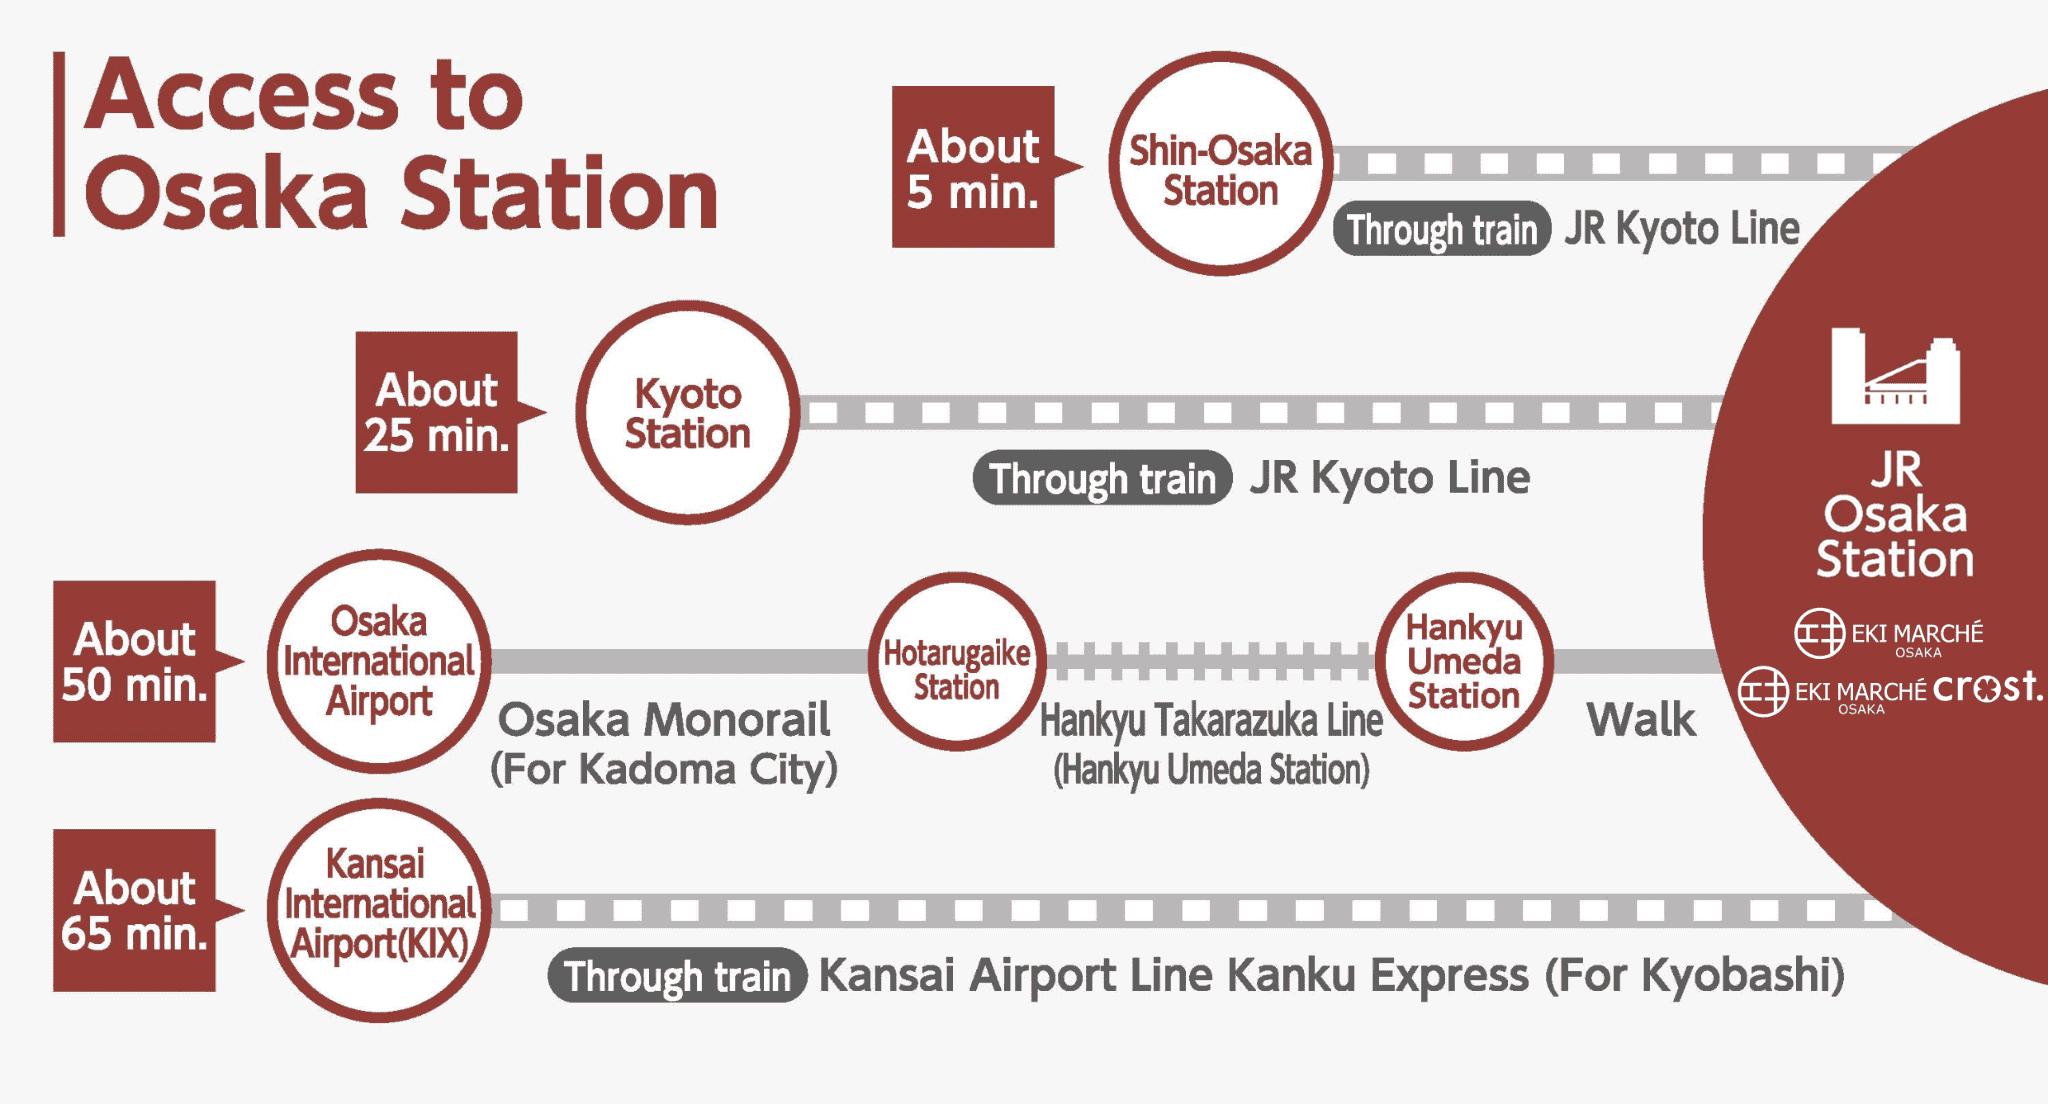 Access to Osaka Station